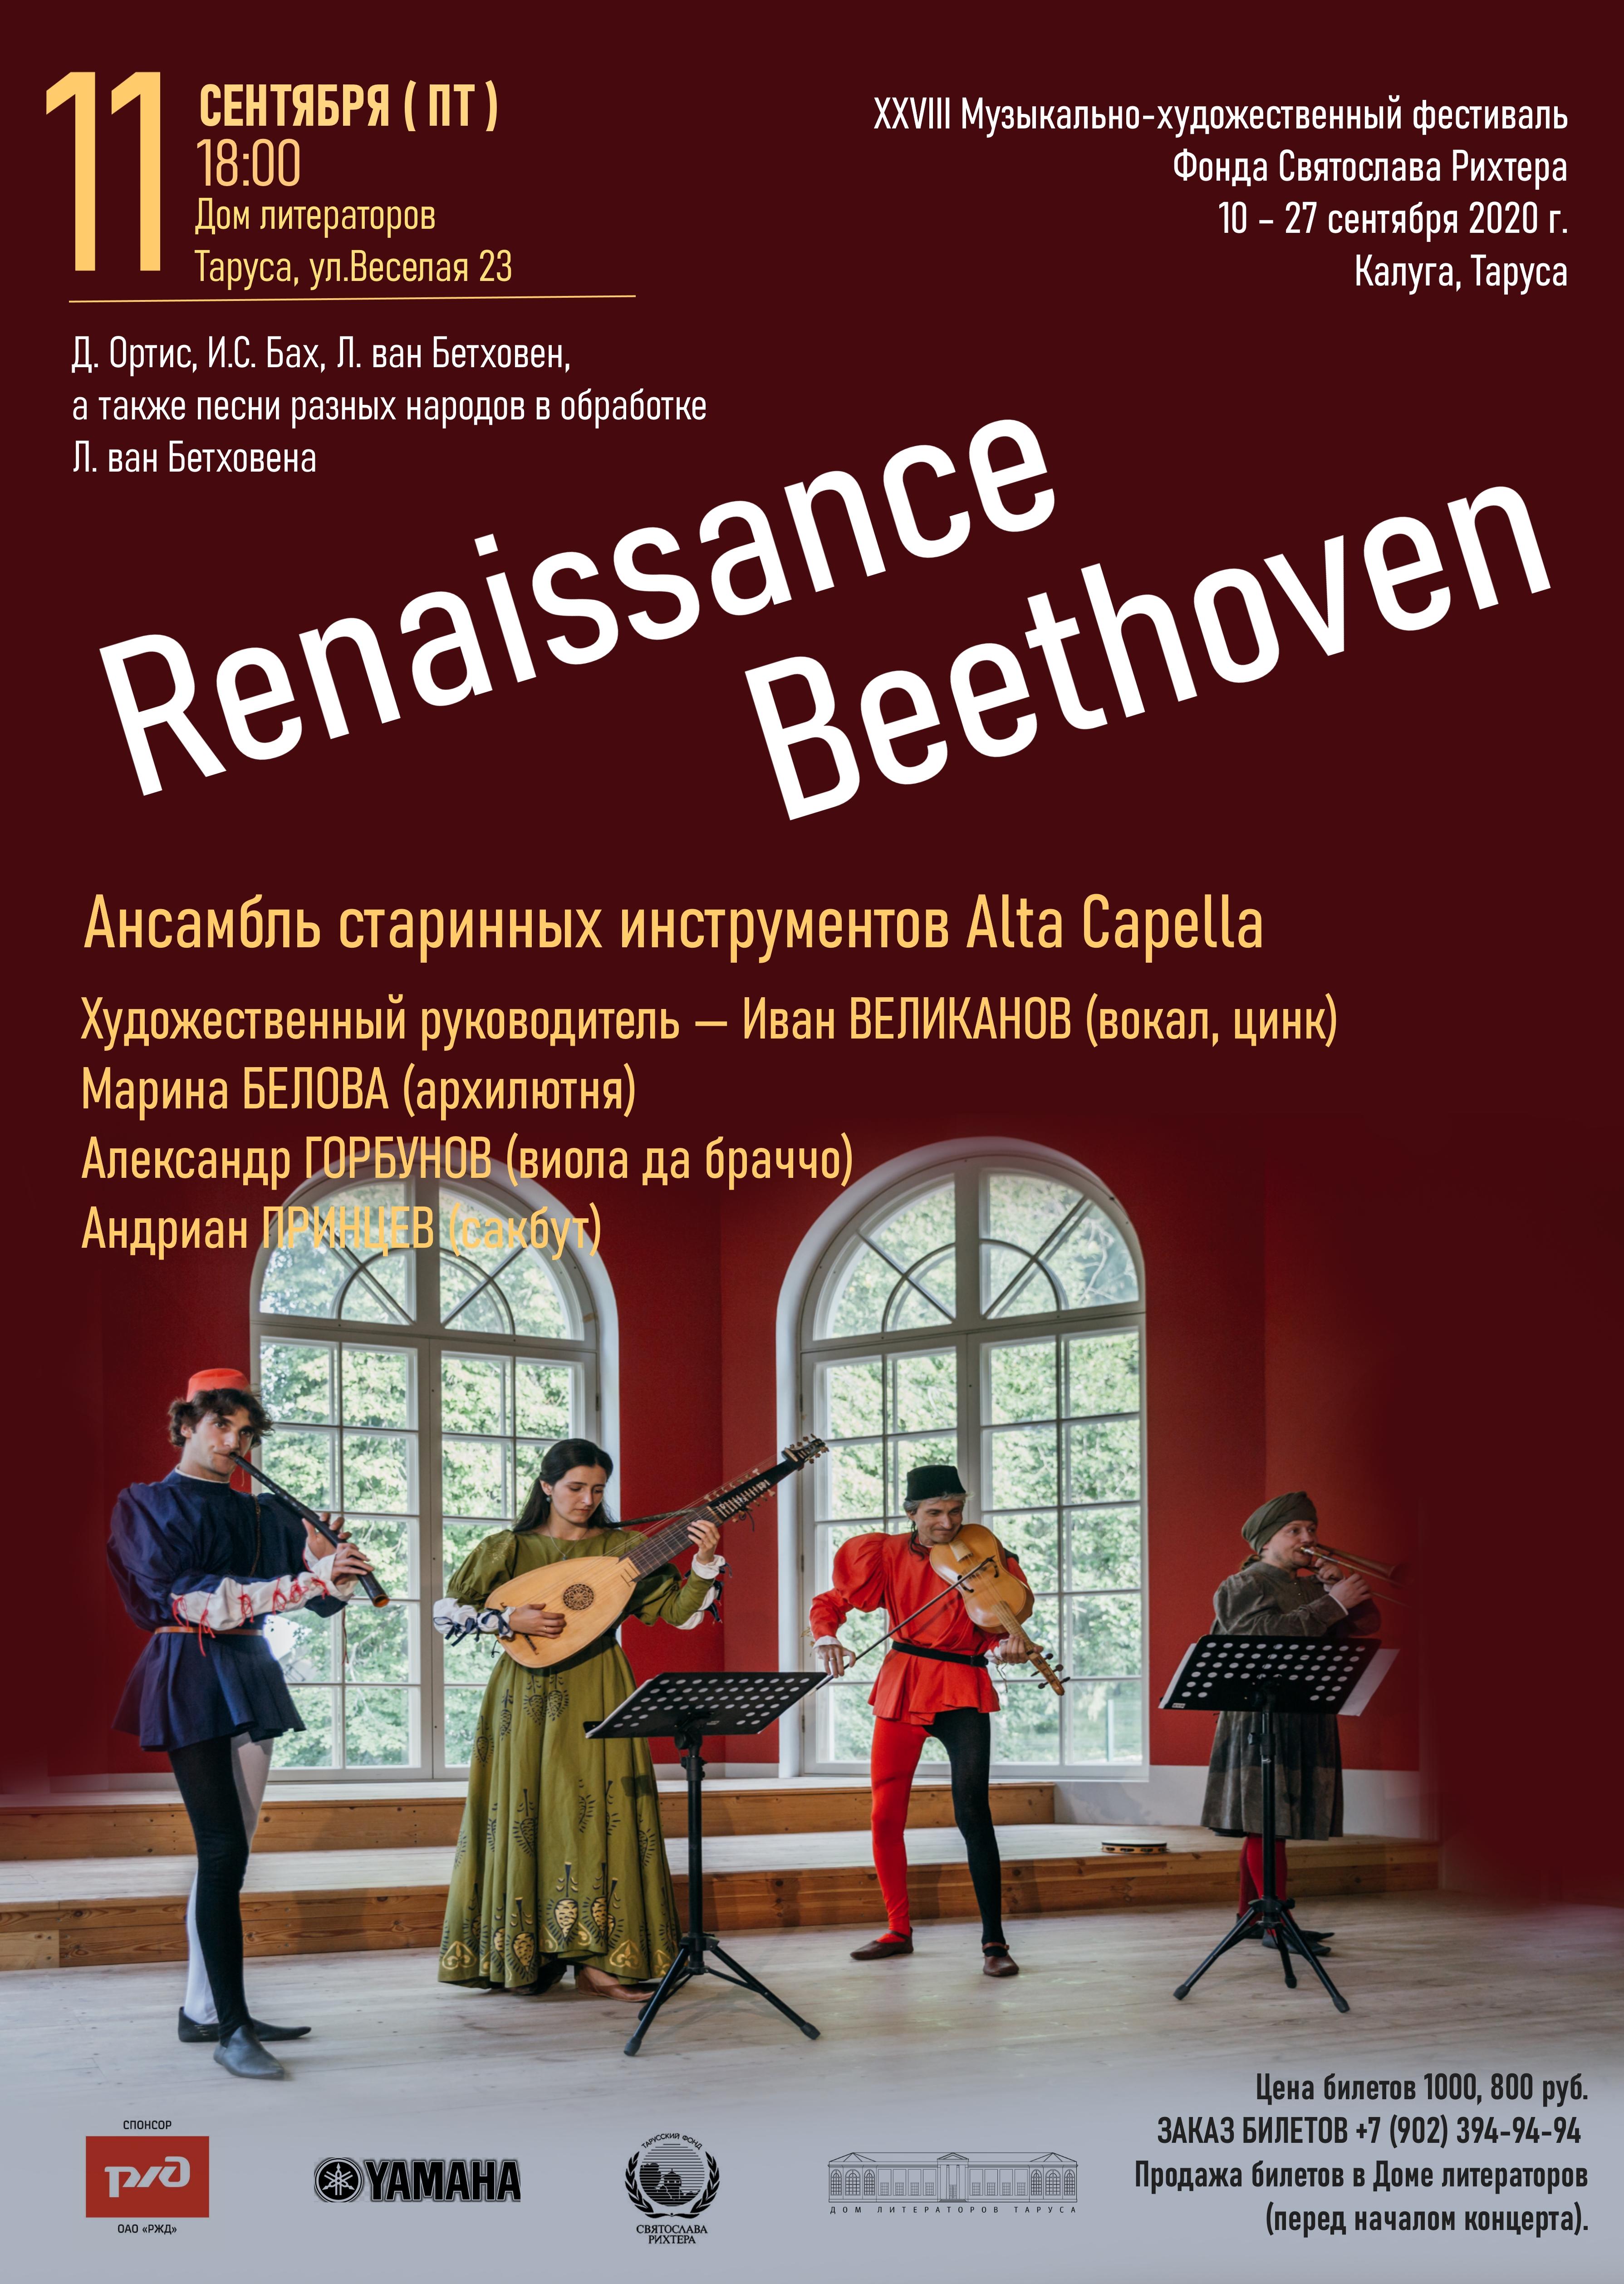 Renaissance Beethoven